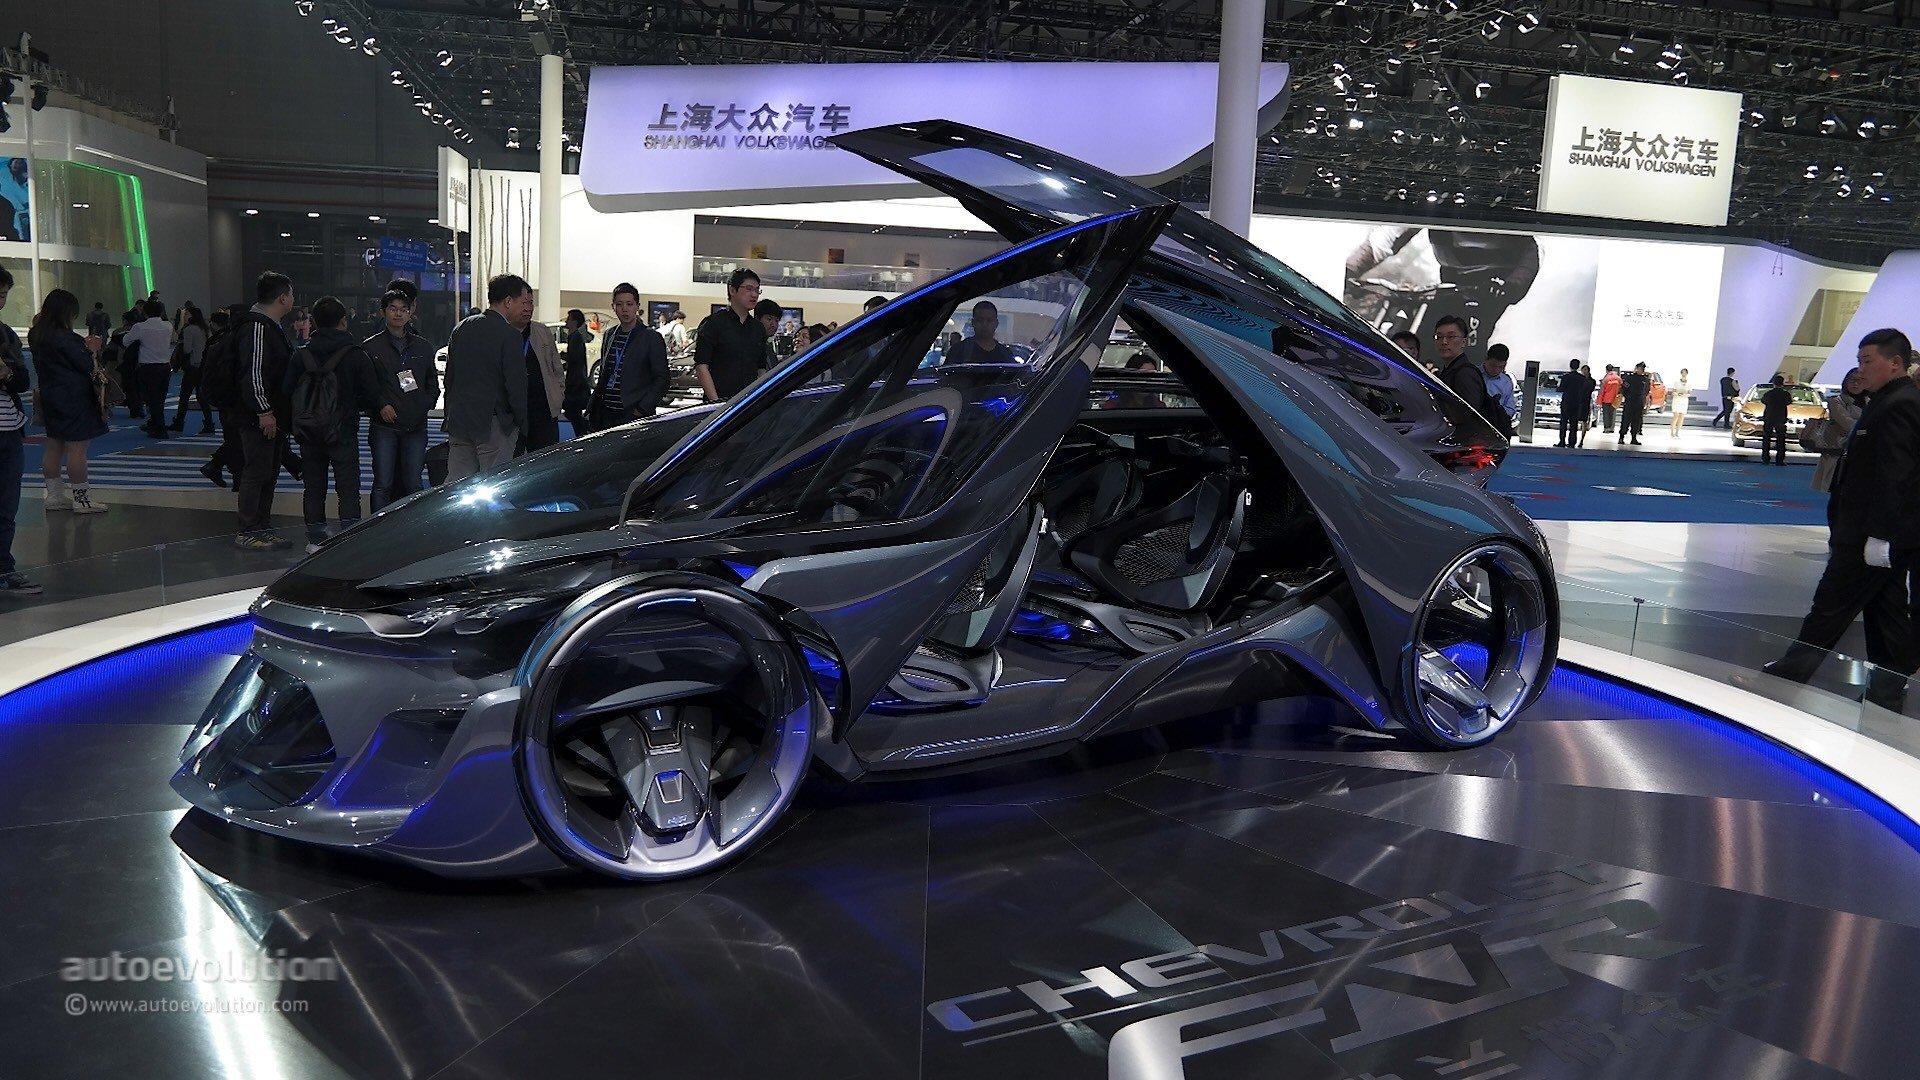 Chevy Concept Cars 2015 Chevrolet FNR Concept ...